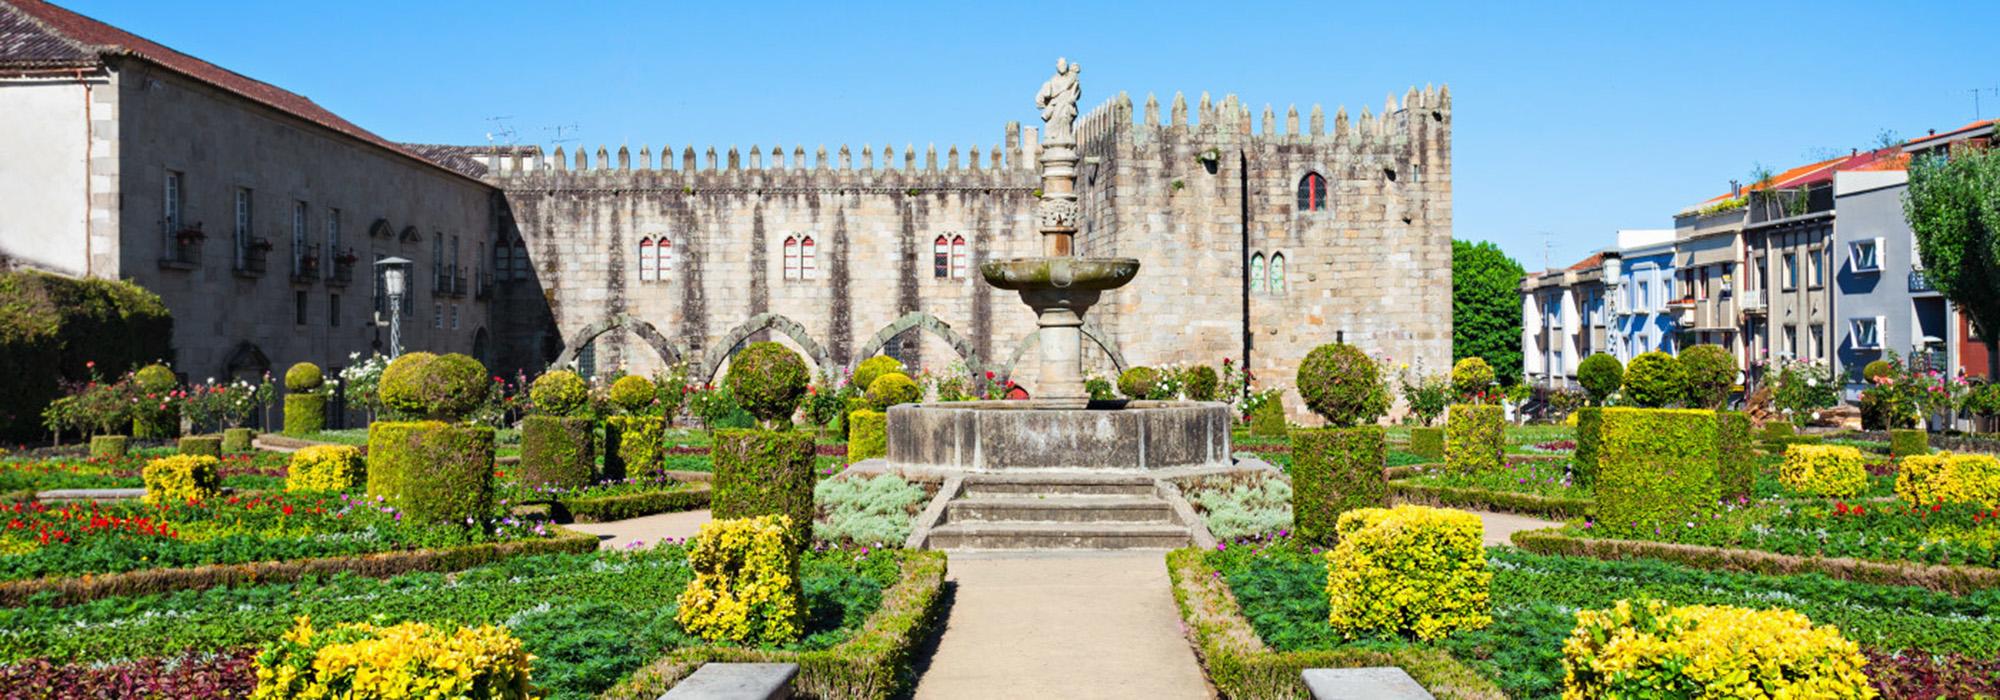 JardimdeSantaBarbara_BragaPortugal_CourtesyEuropesBestDestinations.jpg